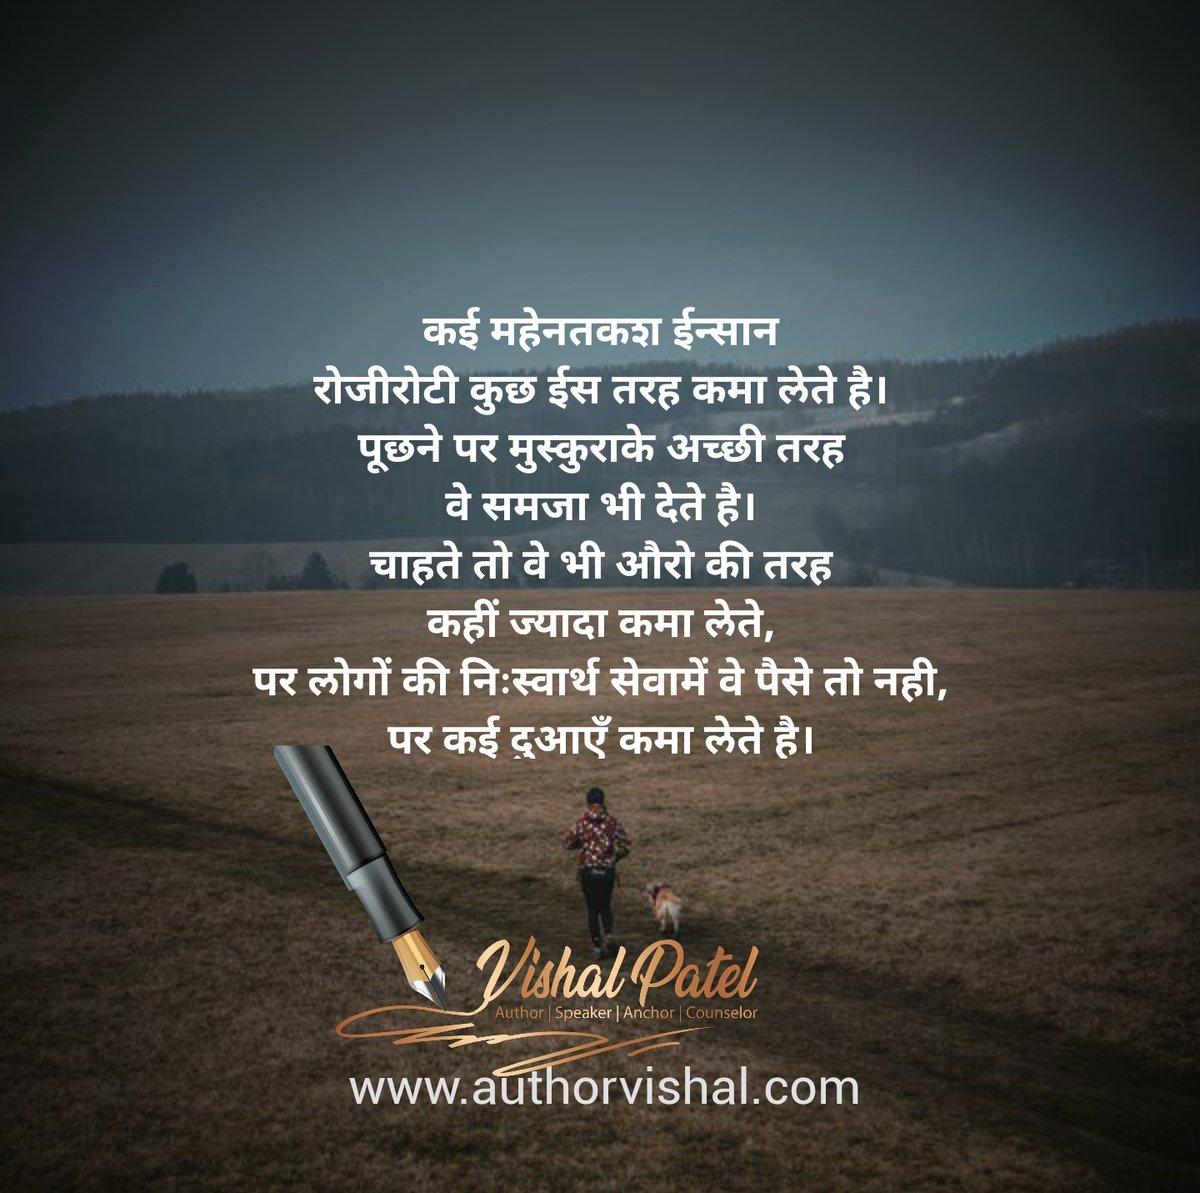 #authorvishalpatel #Hindi #hindipoetry #HindiPanktiyaan #Hindistan #Hindia #MotivationalQuotes #Motivation #motivational #inspirational #Inspire #inspiration #indianwriters #writerscommunity #writers #writerslife #writersofinstagram #writersofig #writerscommunity #indianwriterspic.twitter.com/BveEgEXOC0